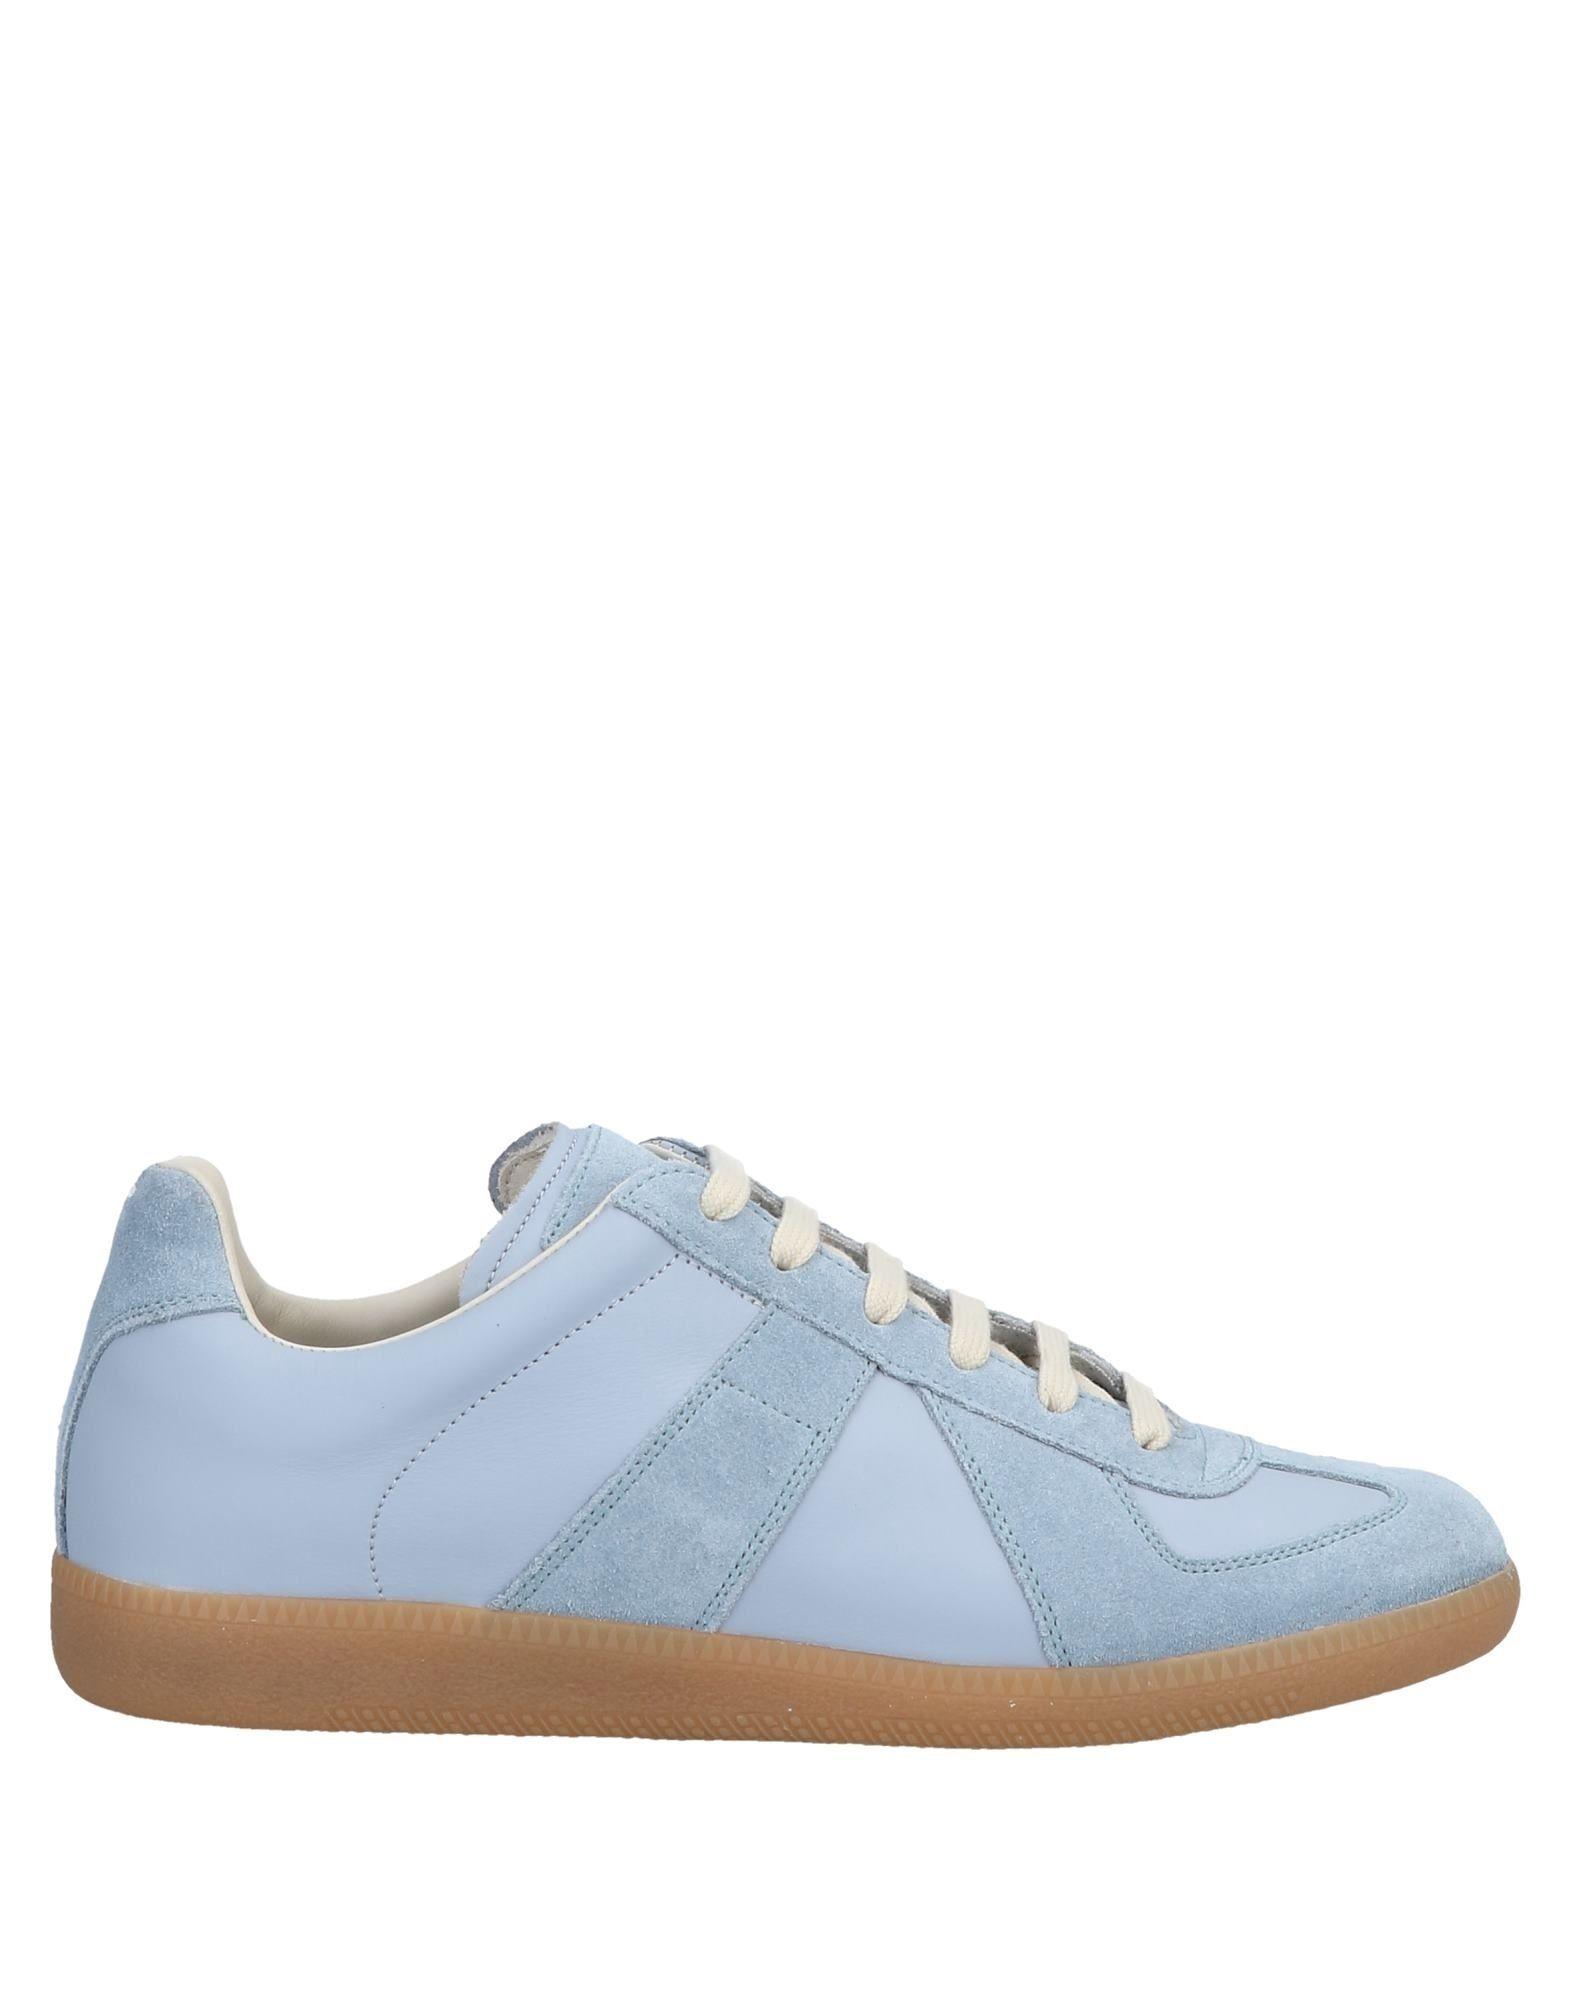 MAISON MARGIELA SNEAKERS. #maisonmargiela #shoes | Maison